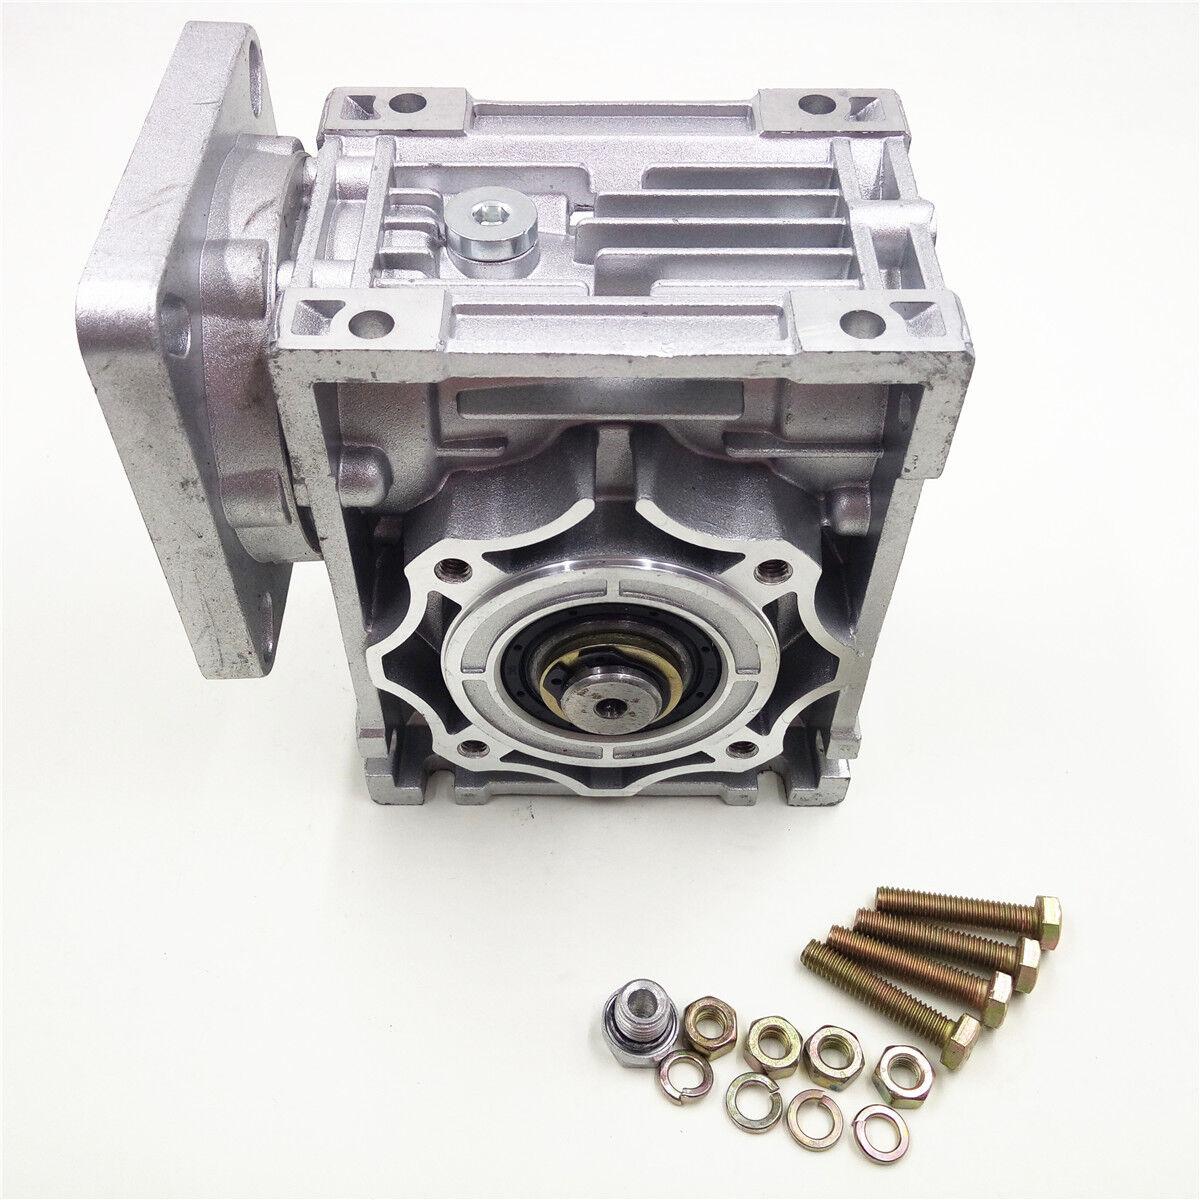 Nema34 Worm Gearbox Geared Speed Reducer 14mm Input Reduction for Stepper Motor 4